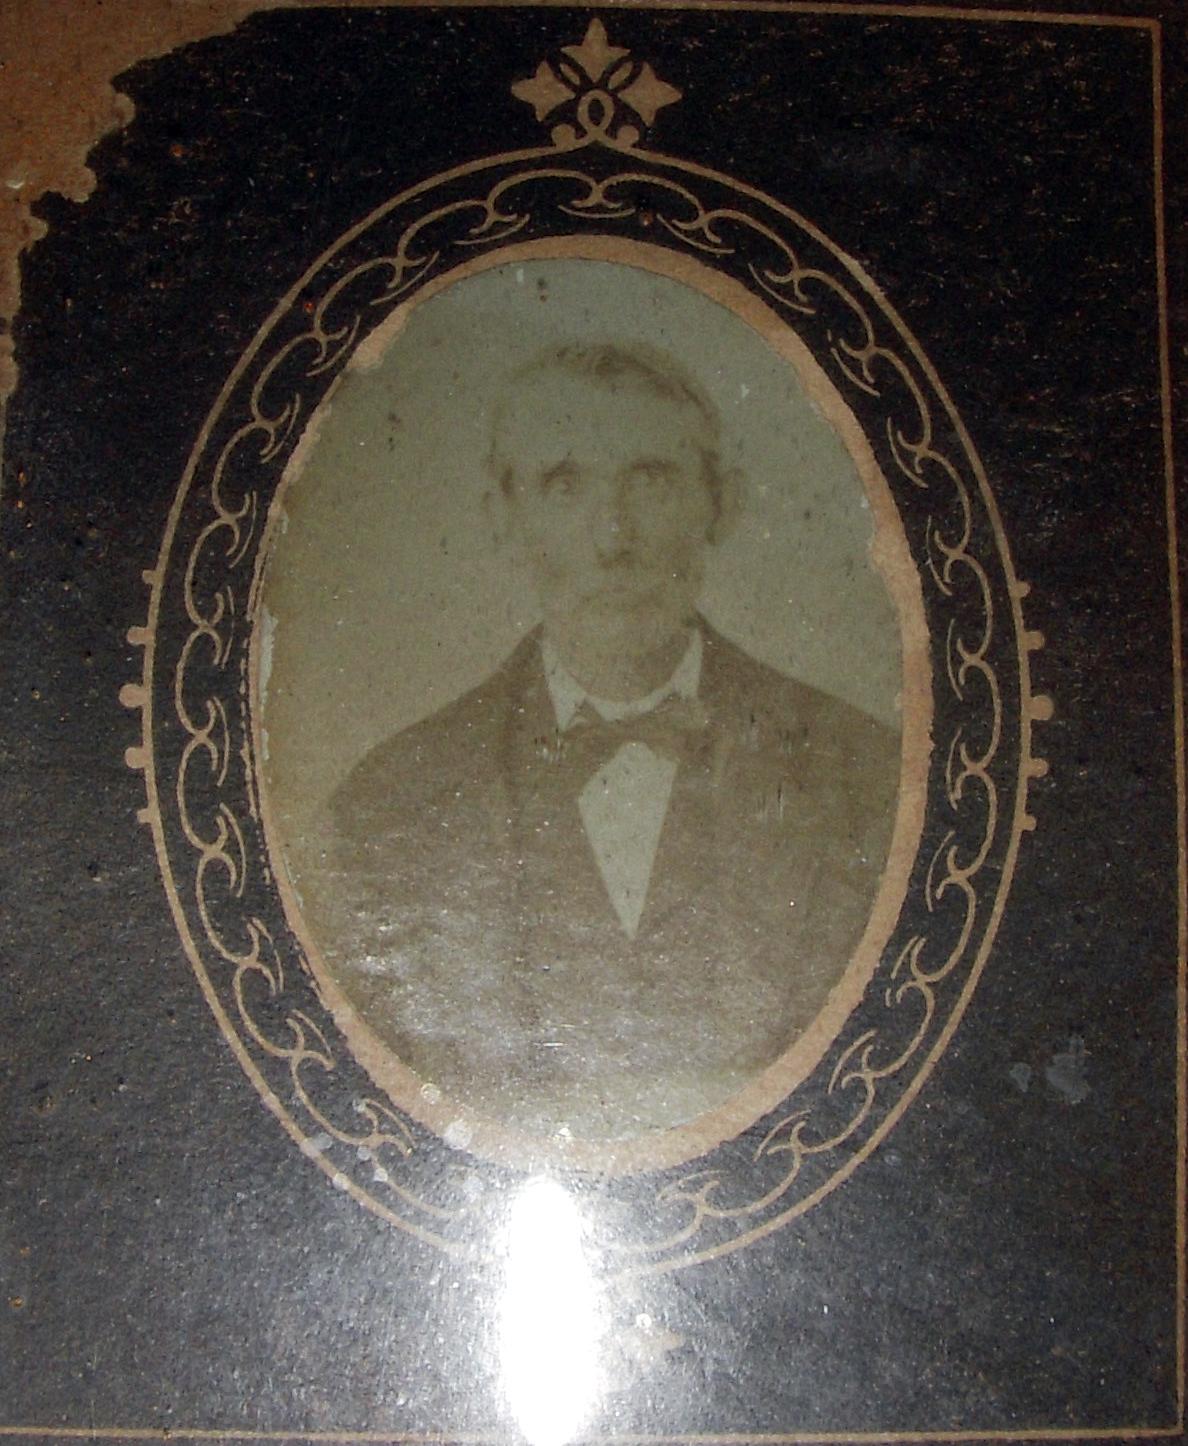 Emory Columbus Yates